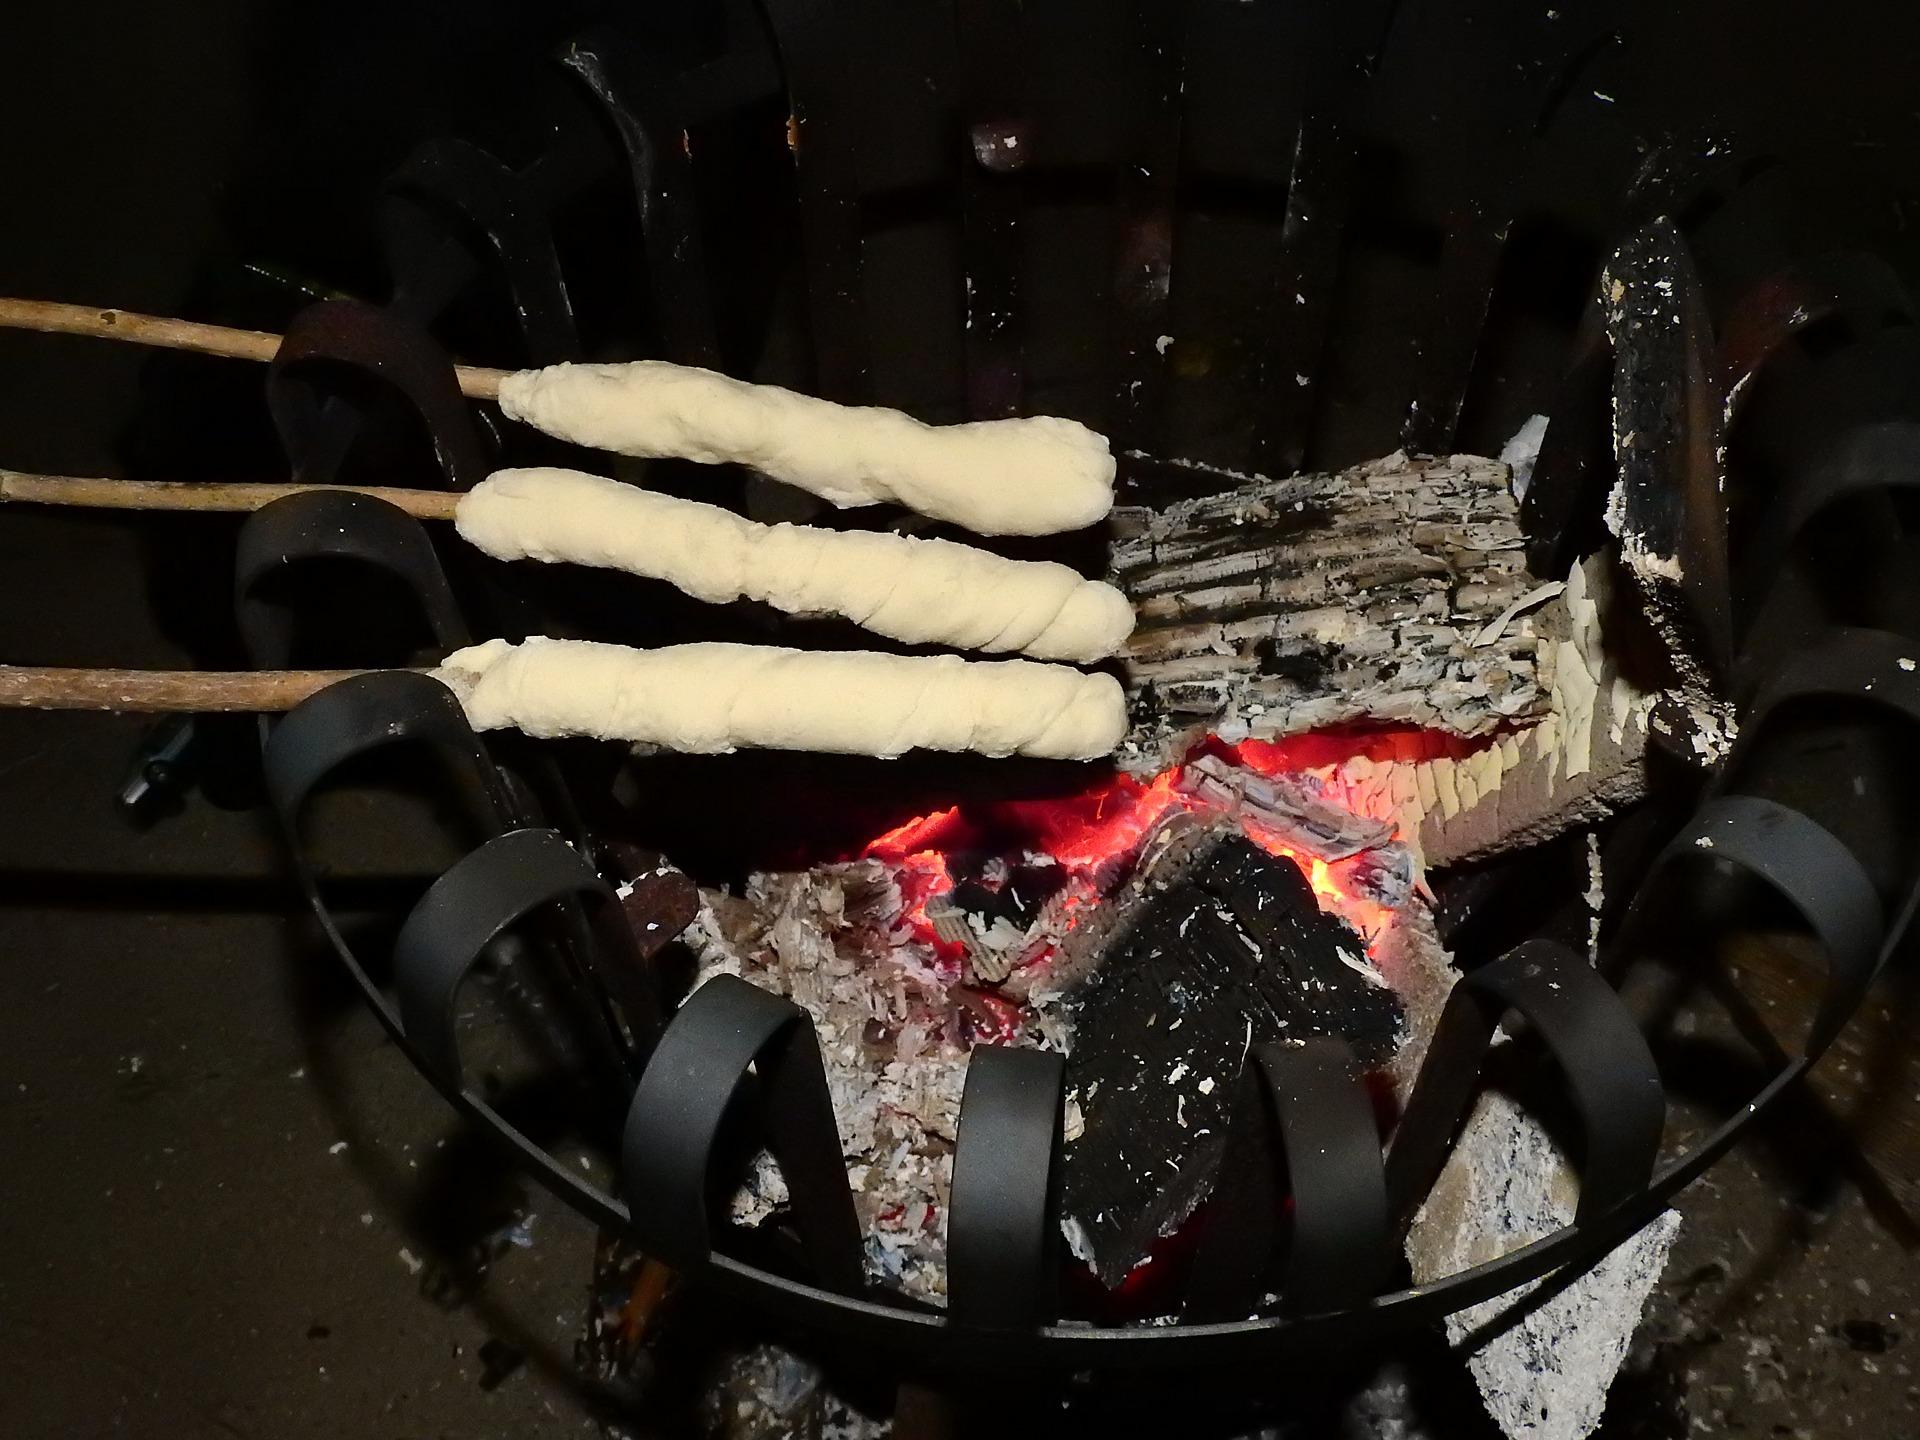 stick-bread-2722982_1920.jpg